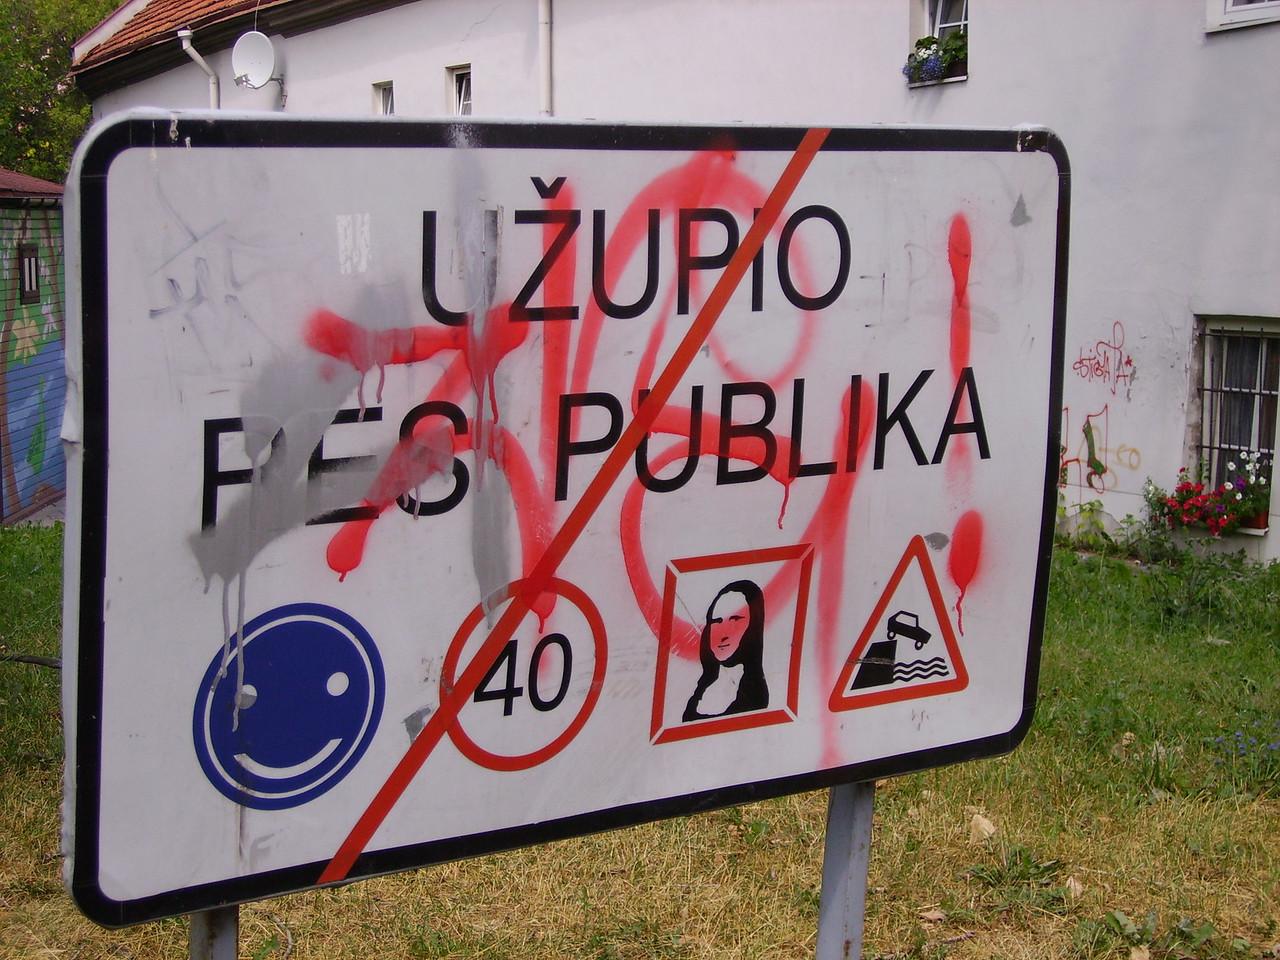 Uzupis is a breakaway state inside Vilnius.